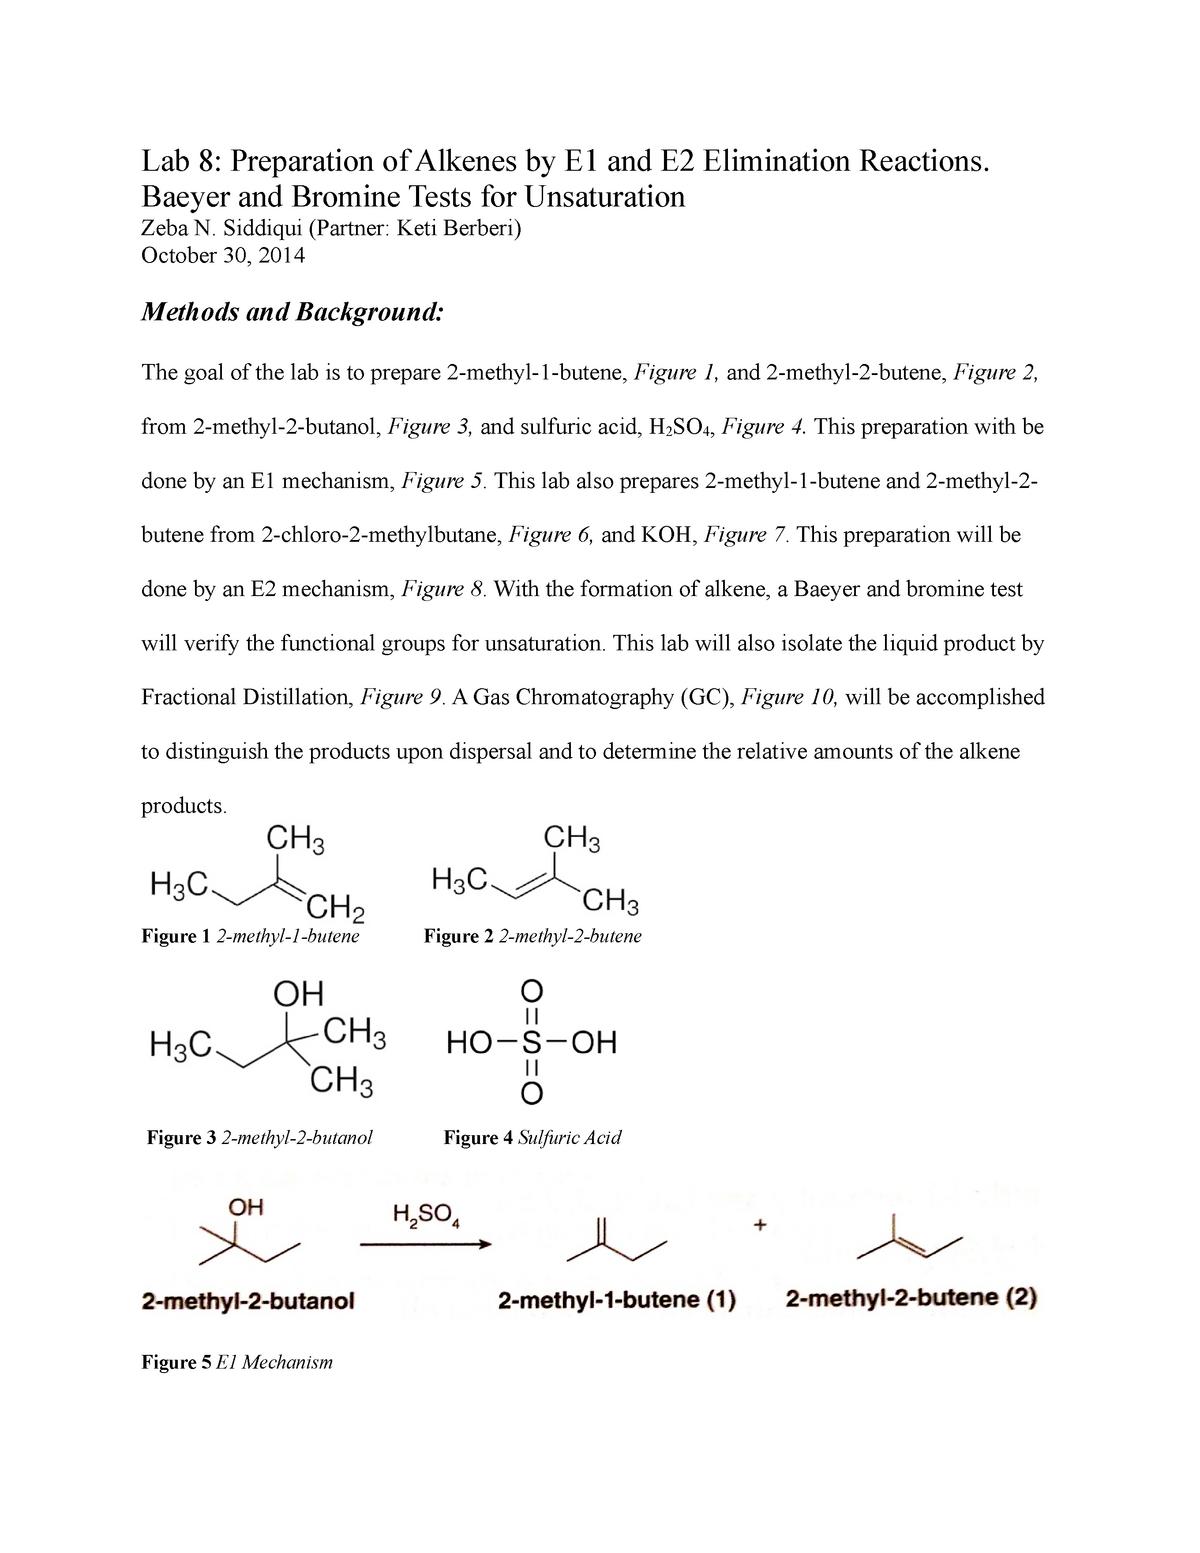 Lab Report 8 - Lecture notes 6 8 - CHEM 233 - UIC - StuDocu